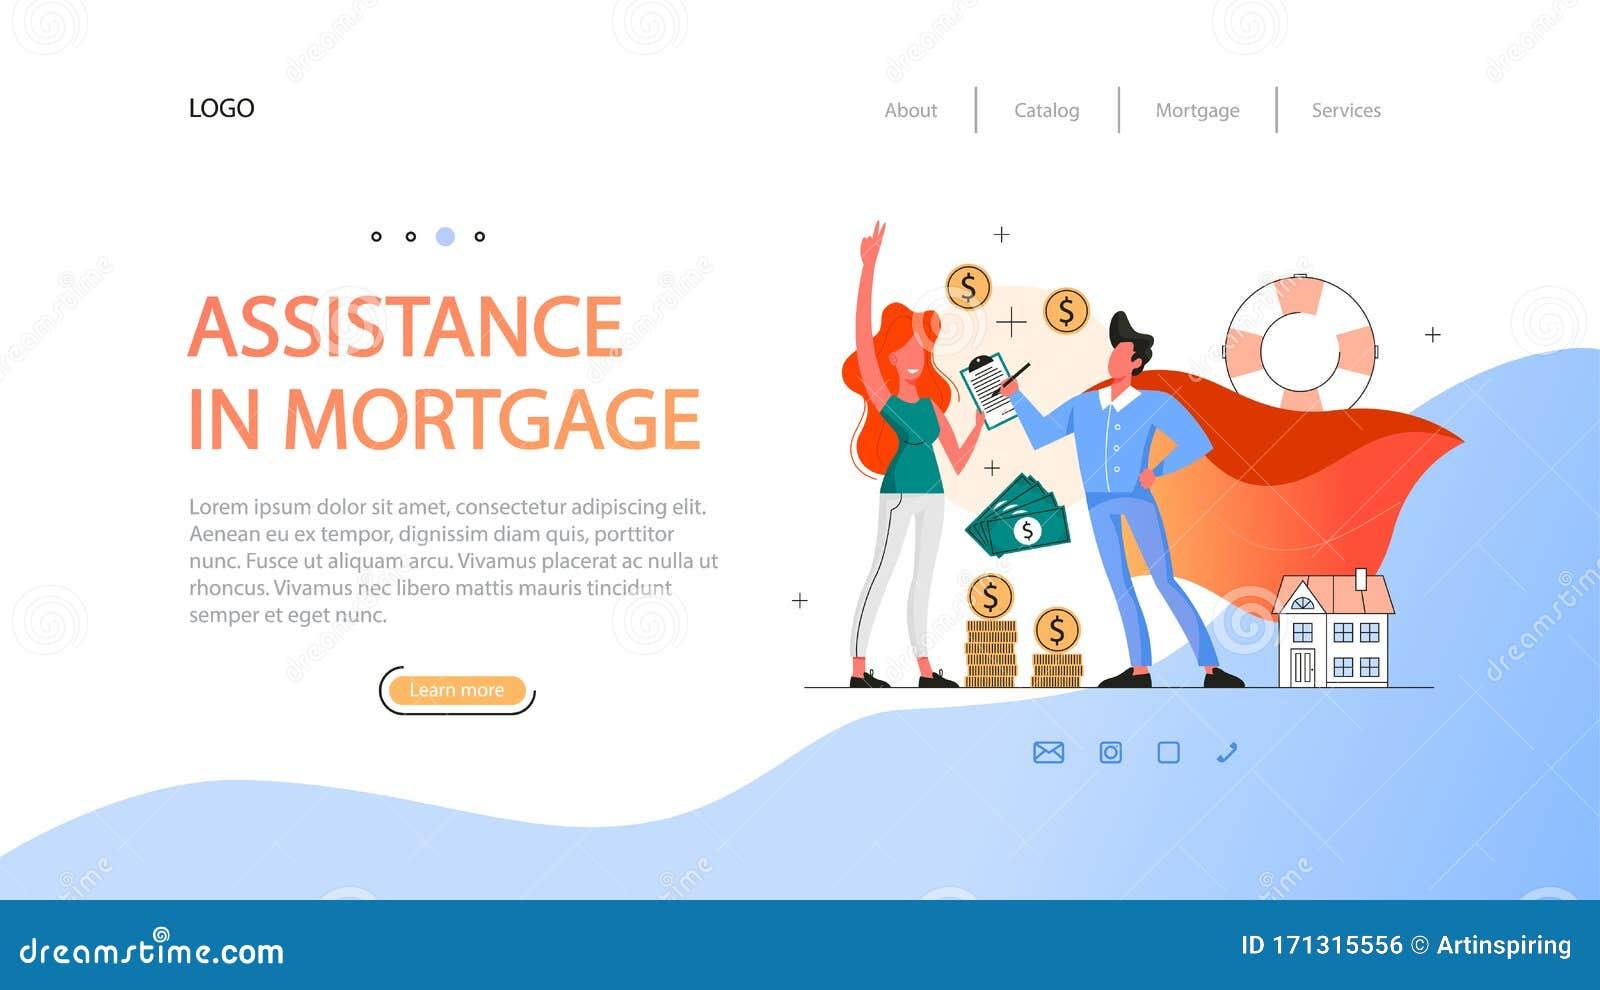 Real Estate Advantage Web Banner Idea Assistance In Mortgage Stock Vector Illustration Of Management Assistance 171315556